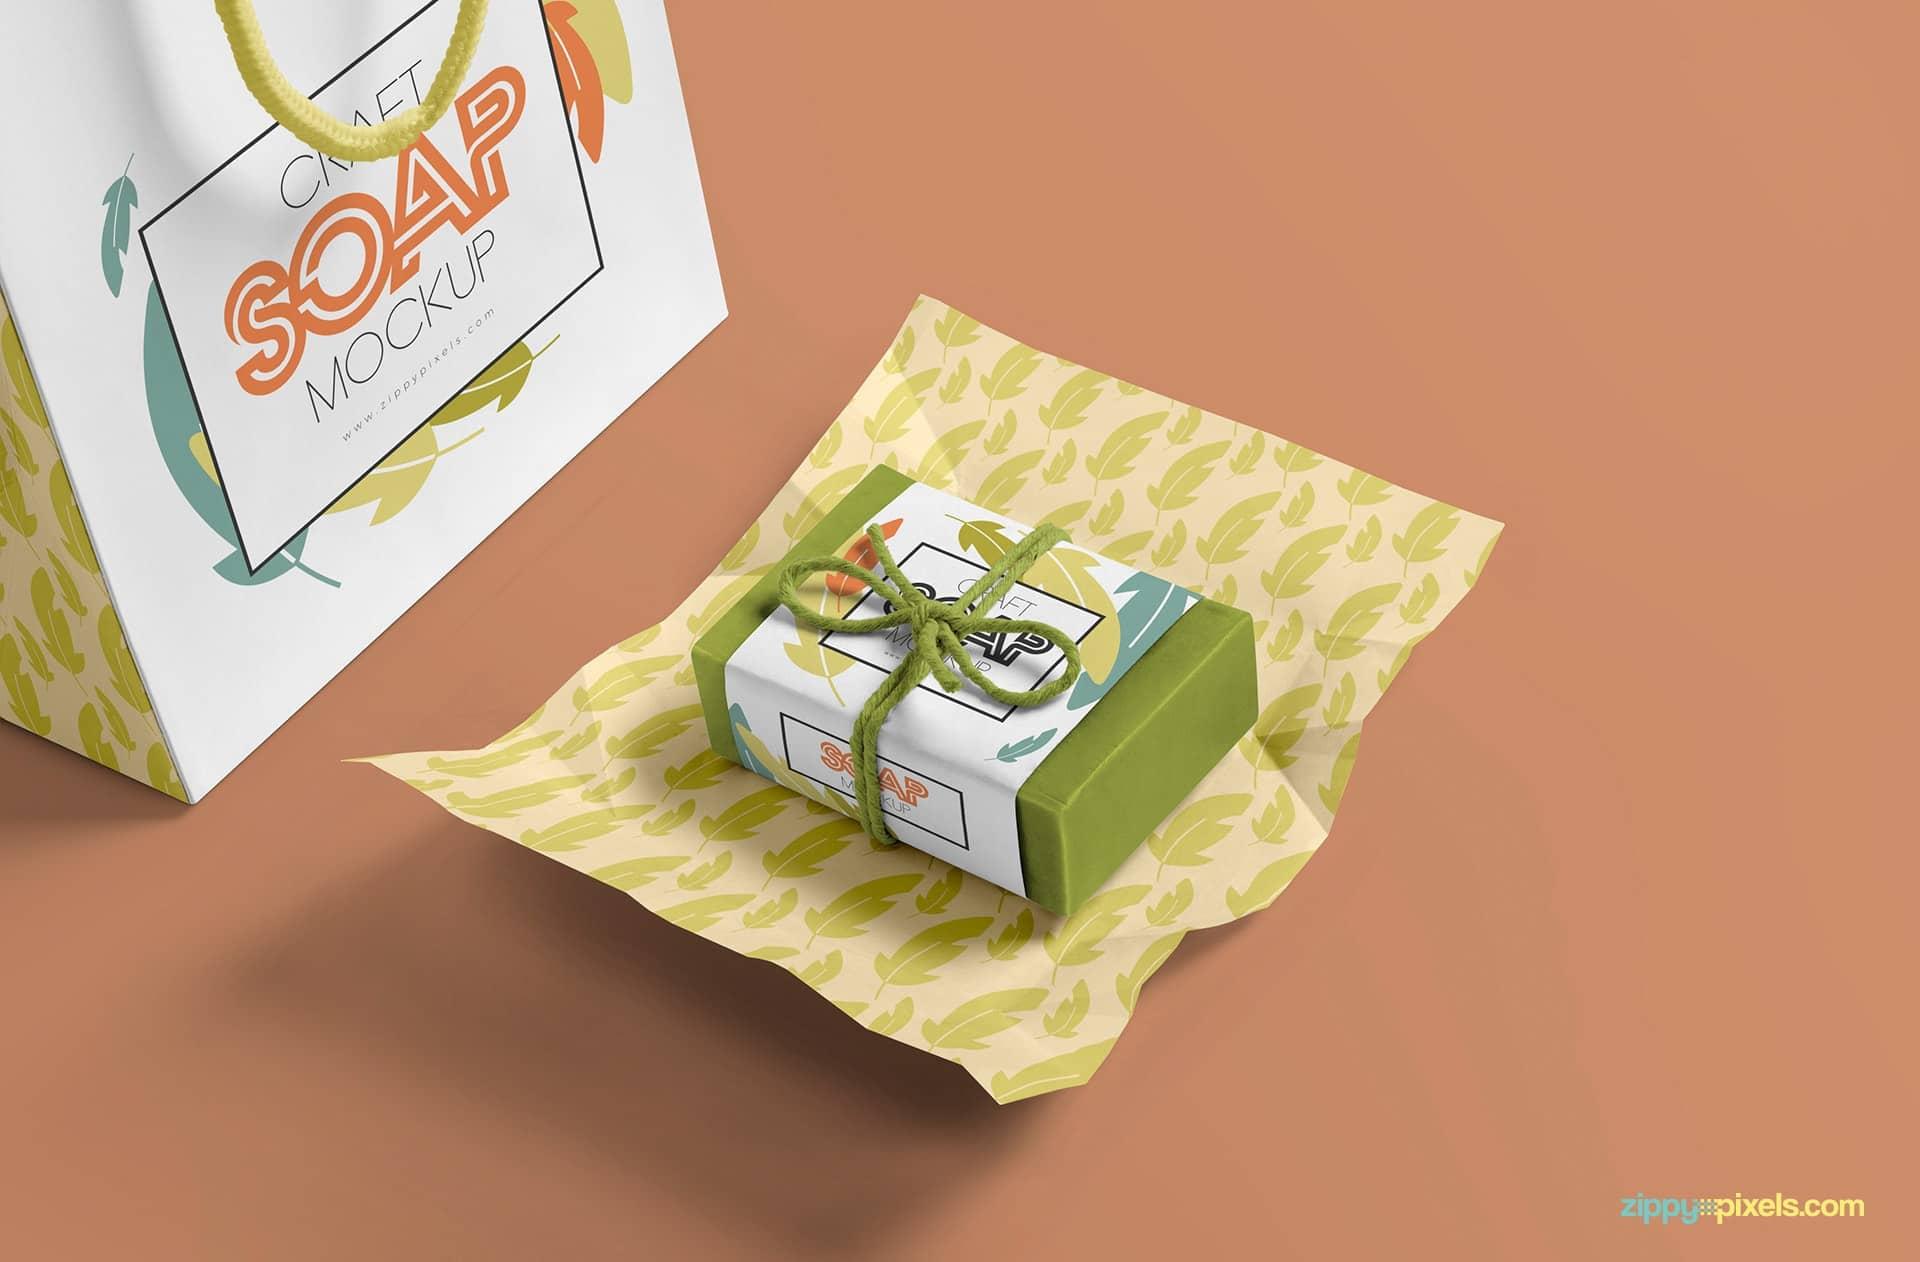 soap bar with shopping bag psd mockup free download